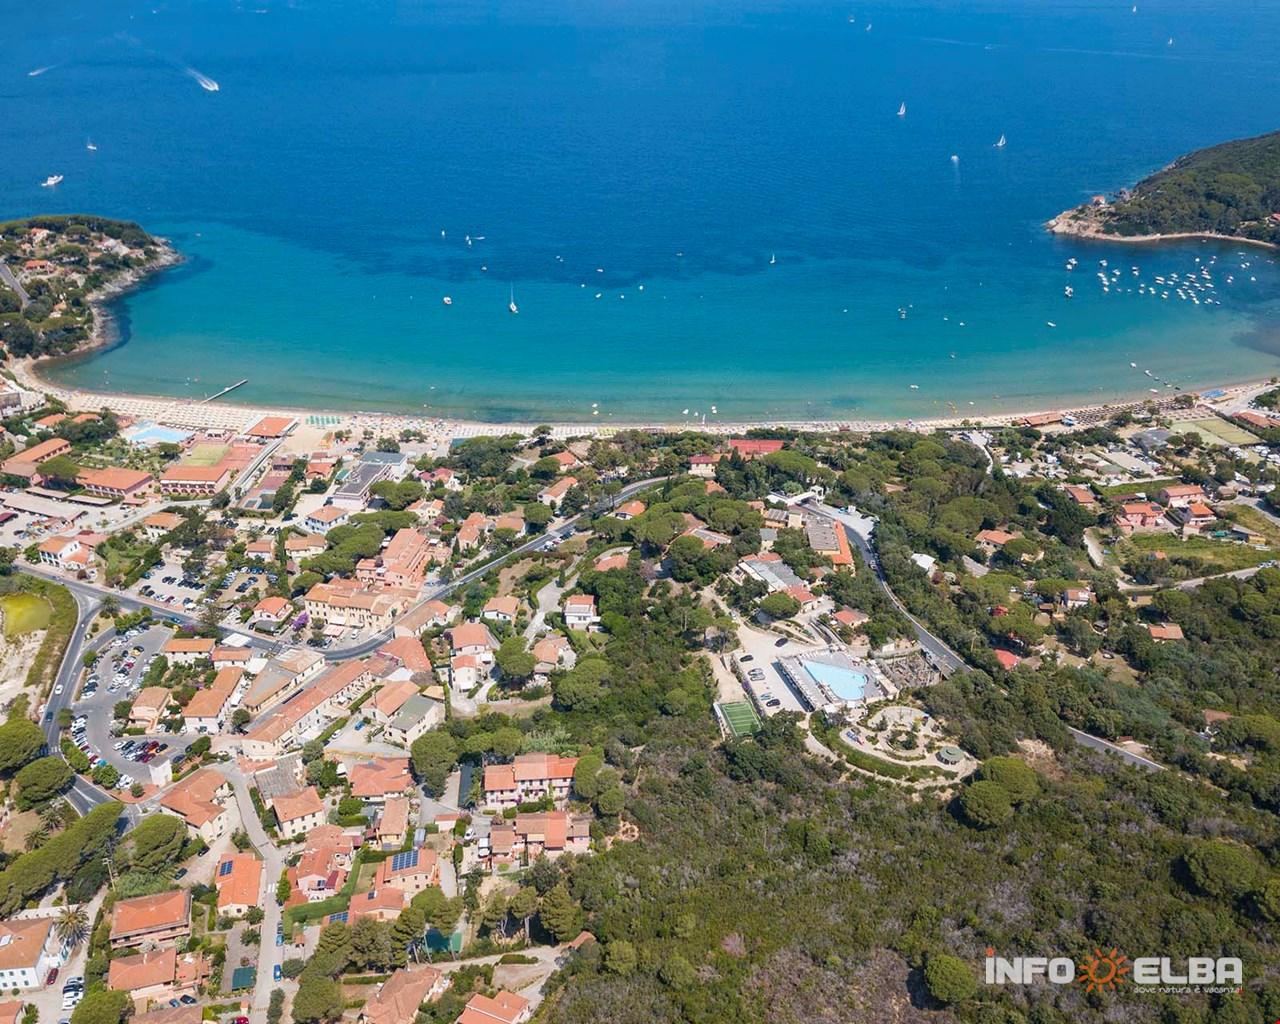 Procchio Elba Karte.Prochio Insel Elba